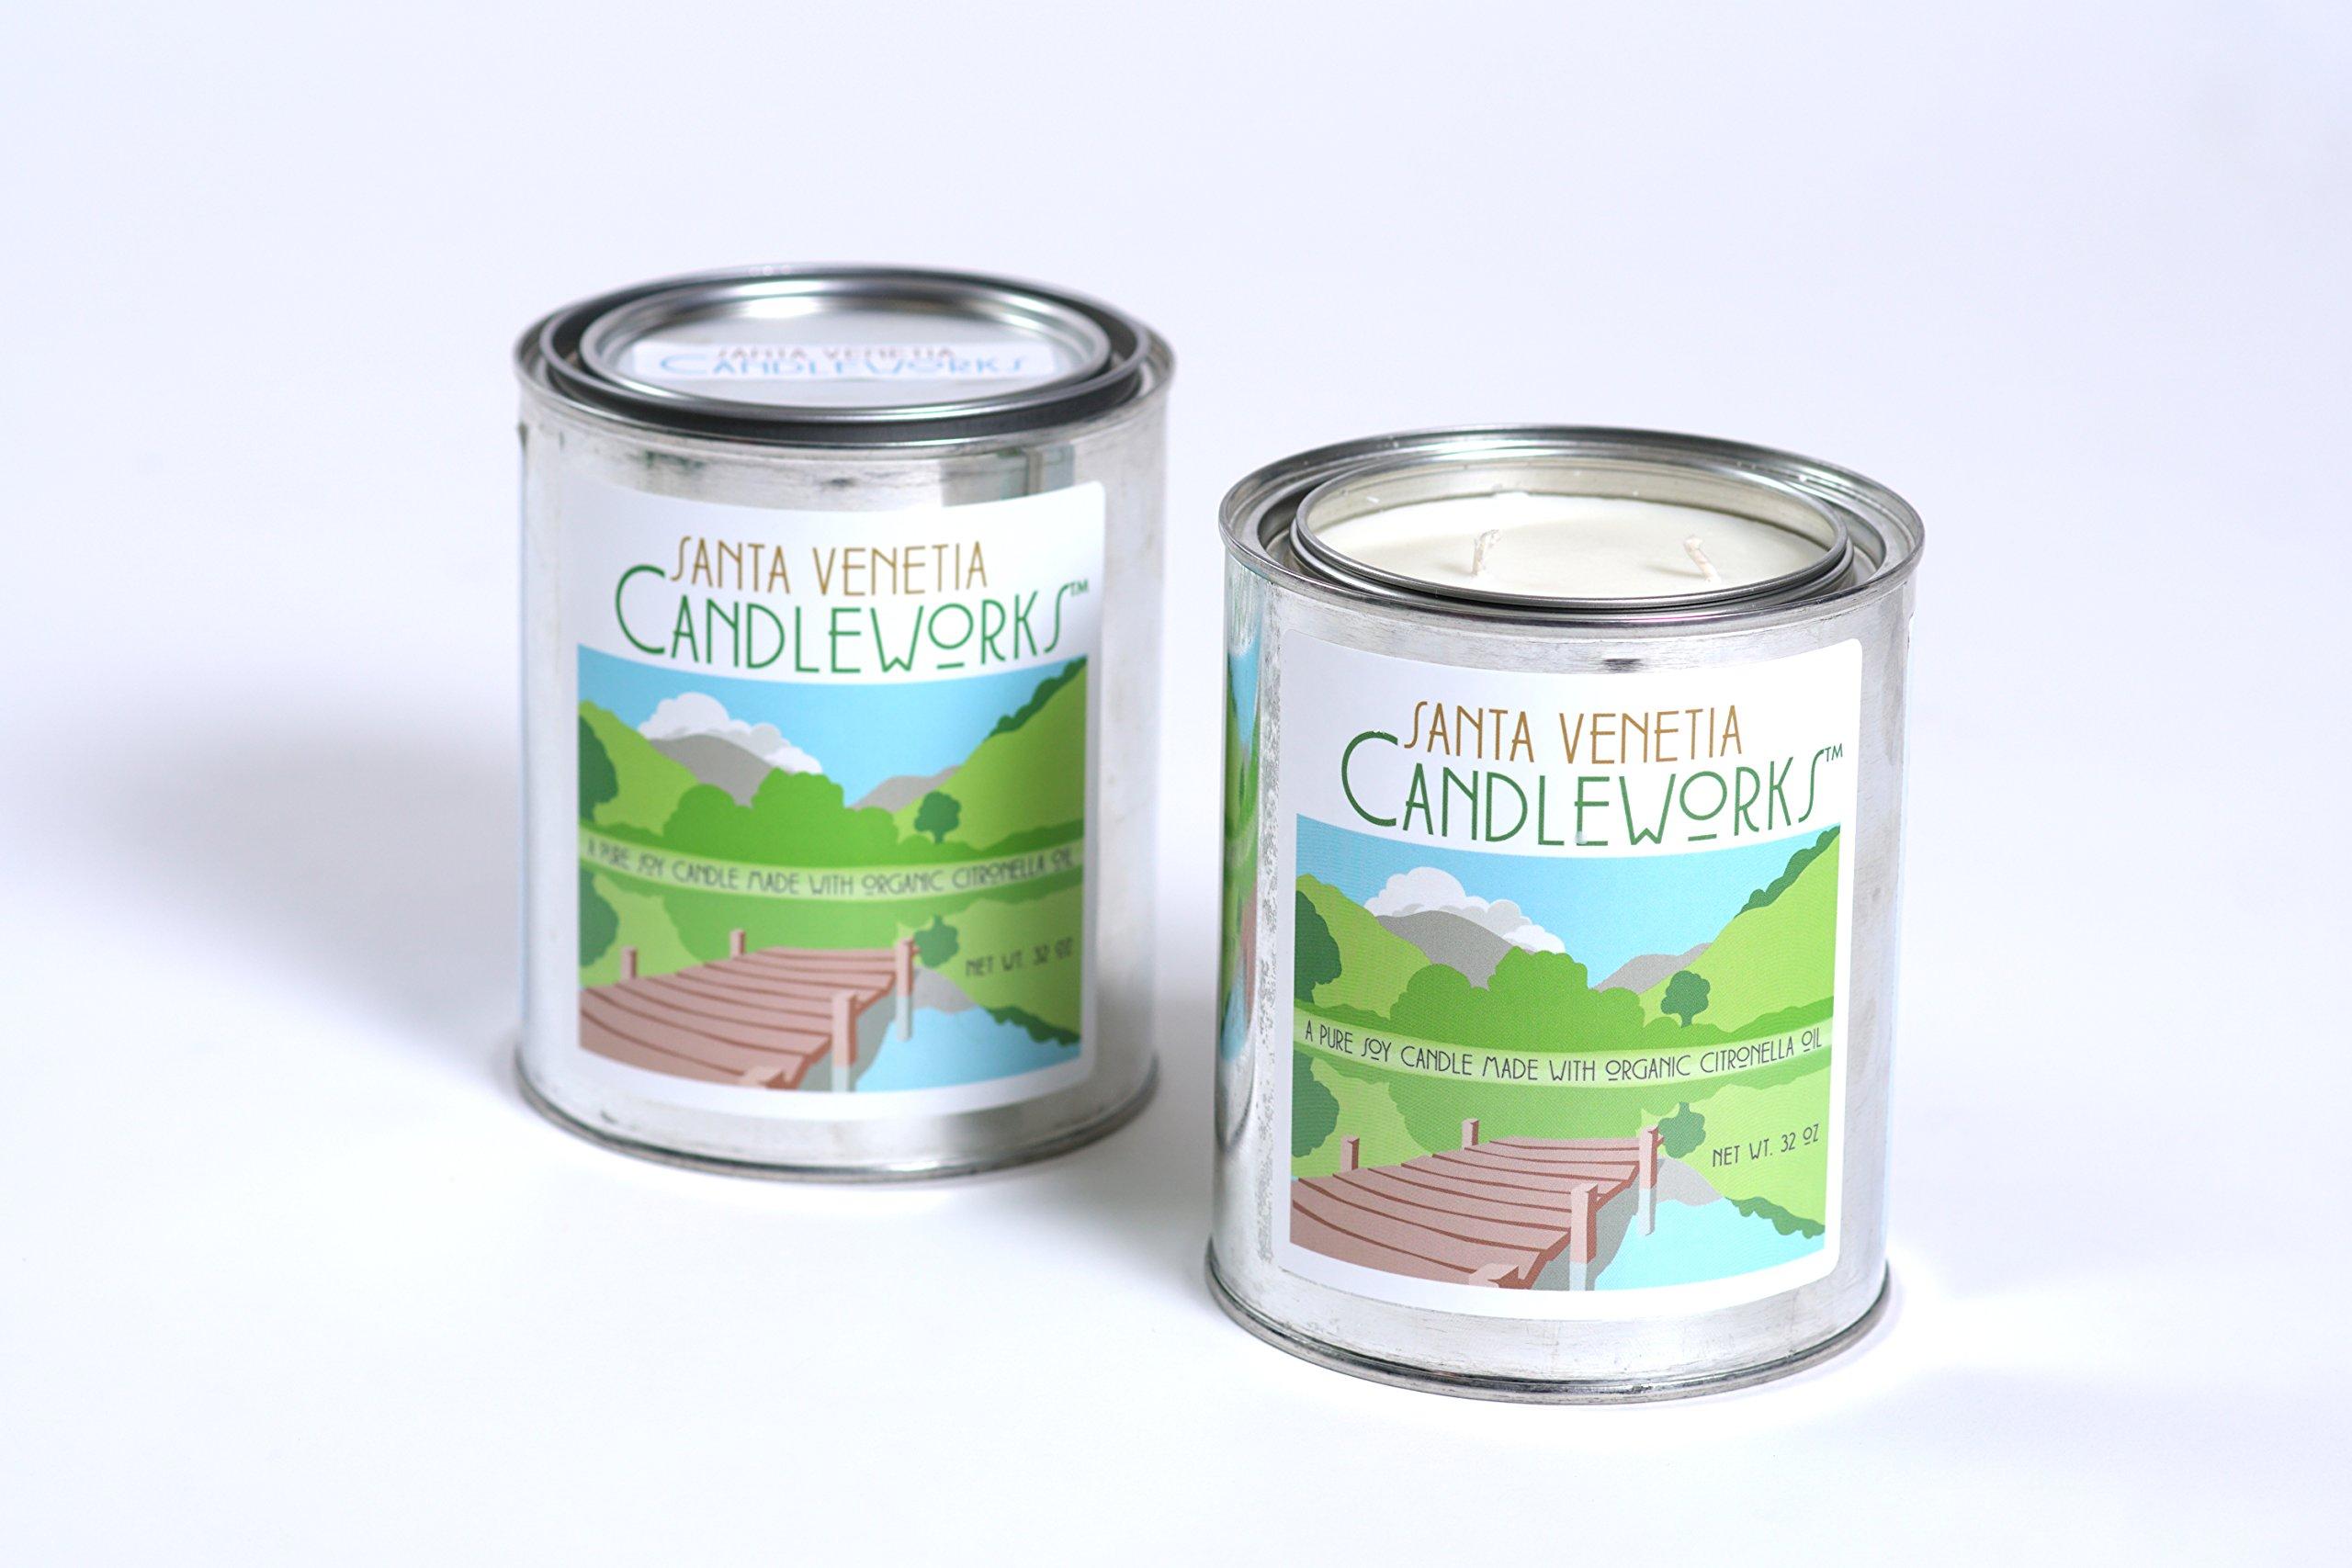 Santa Venetia Candleworks Organic Citronella Patio Candle - 32 oz